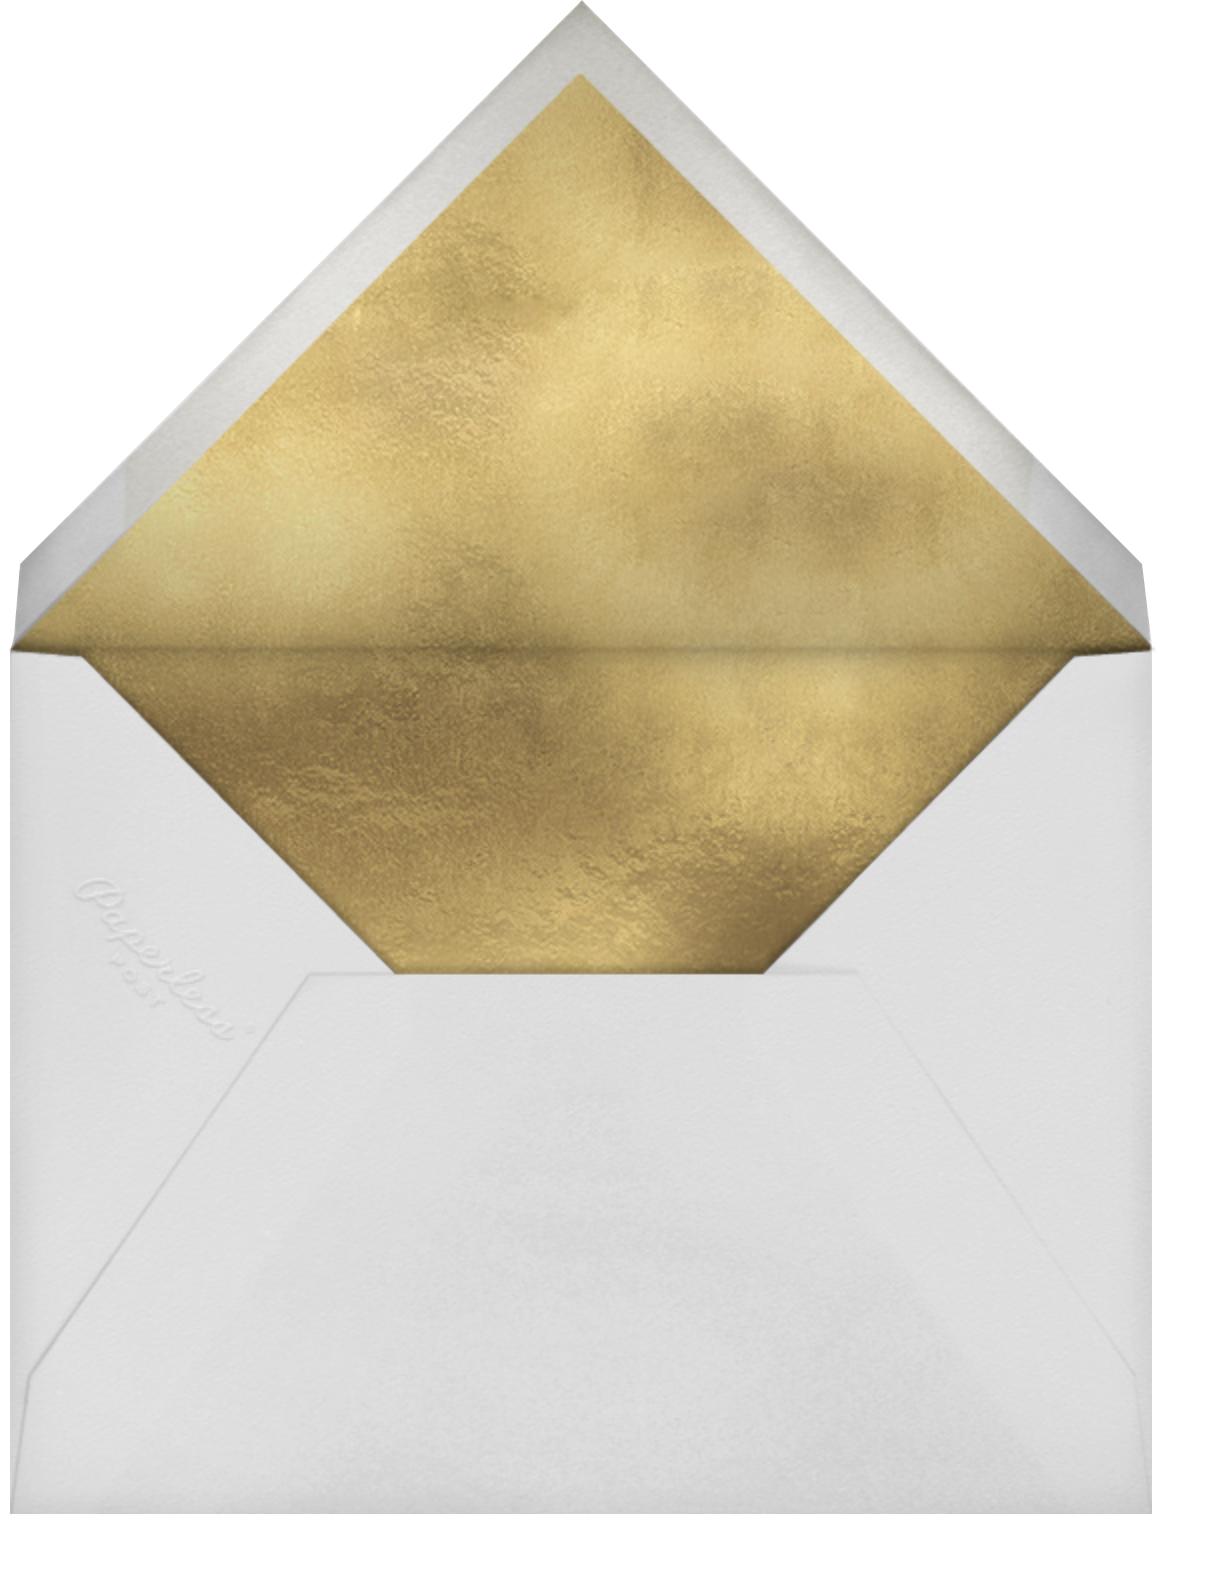 Bright Stripes - kate spade new york - Envelope